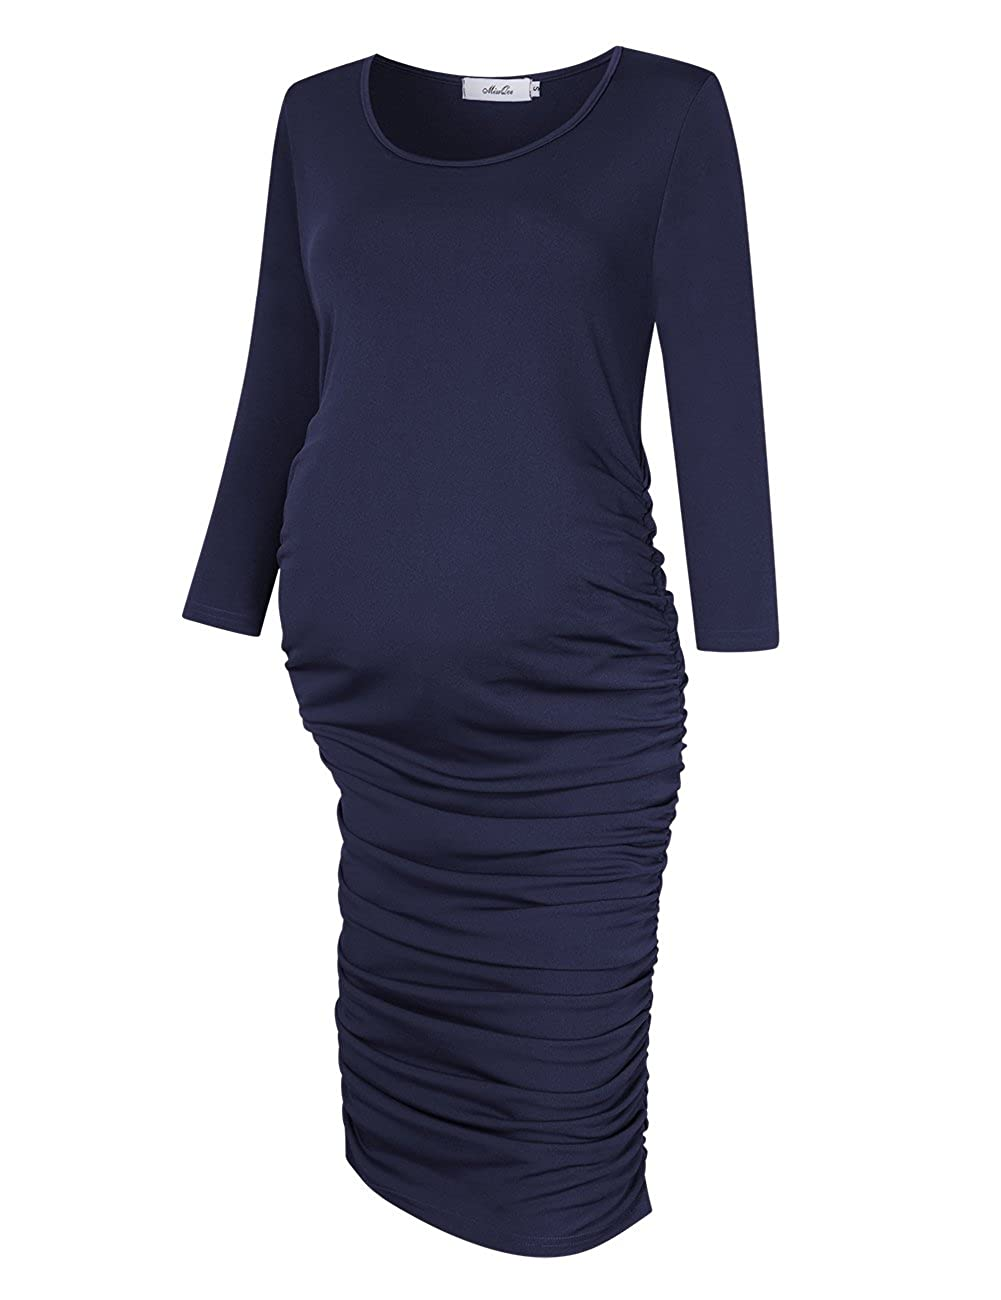 MissQee DRESS レディース B075M9BY4S Medium|Tibetan Blue Tibetan Blue Medium